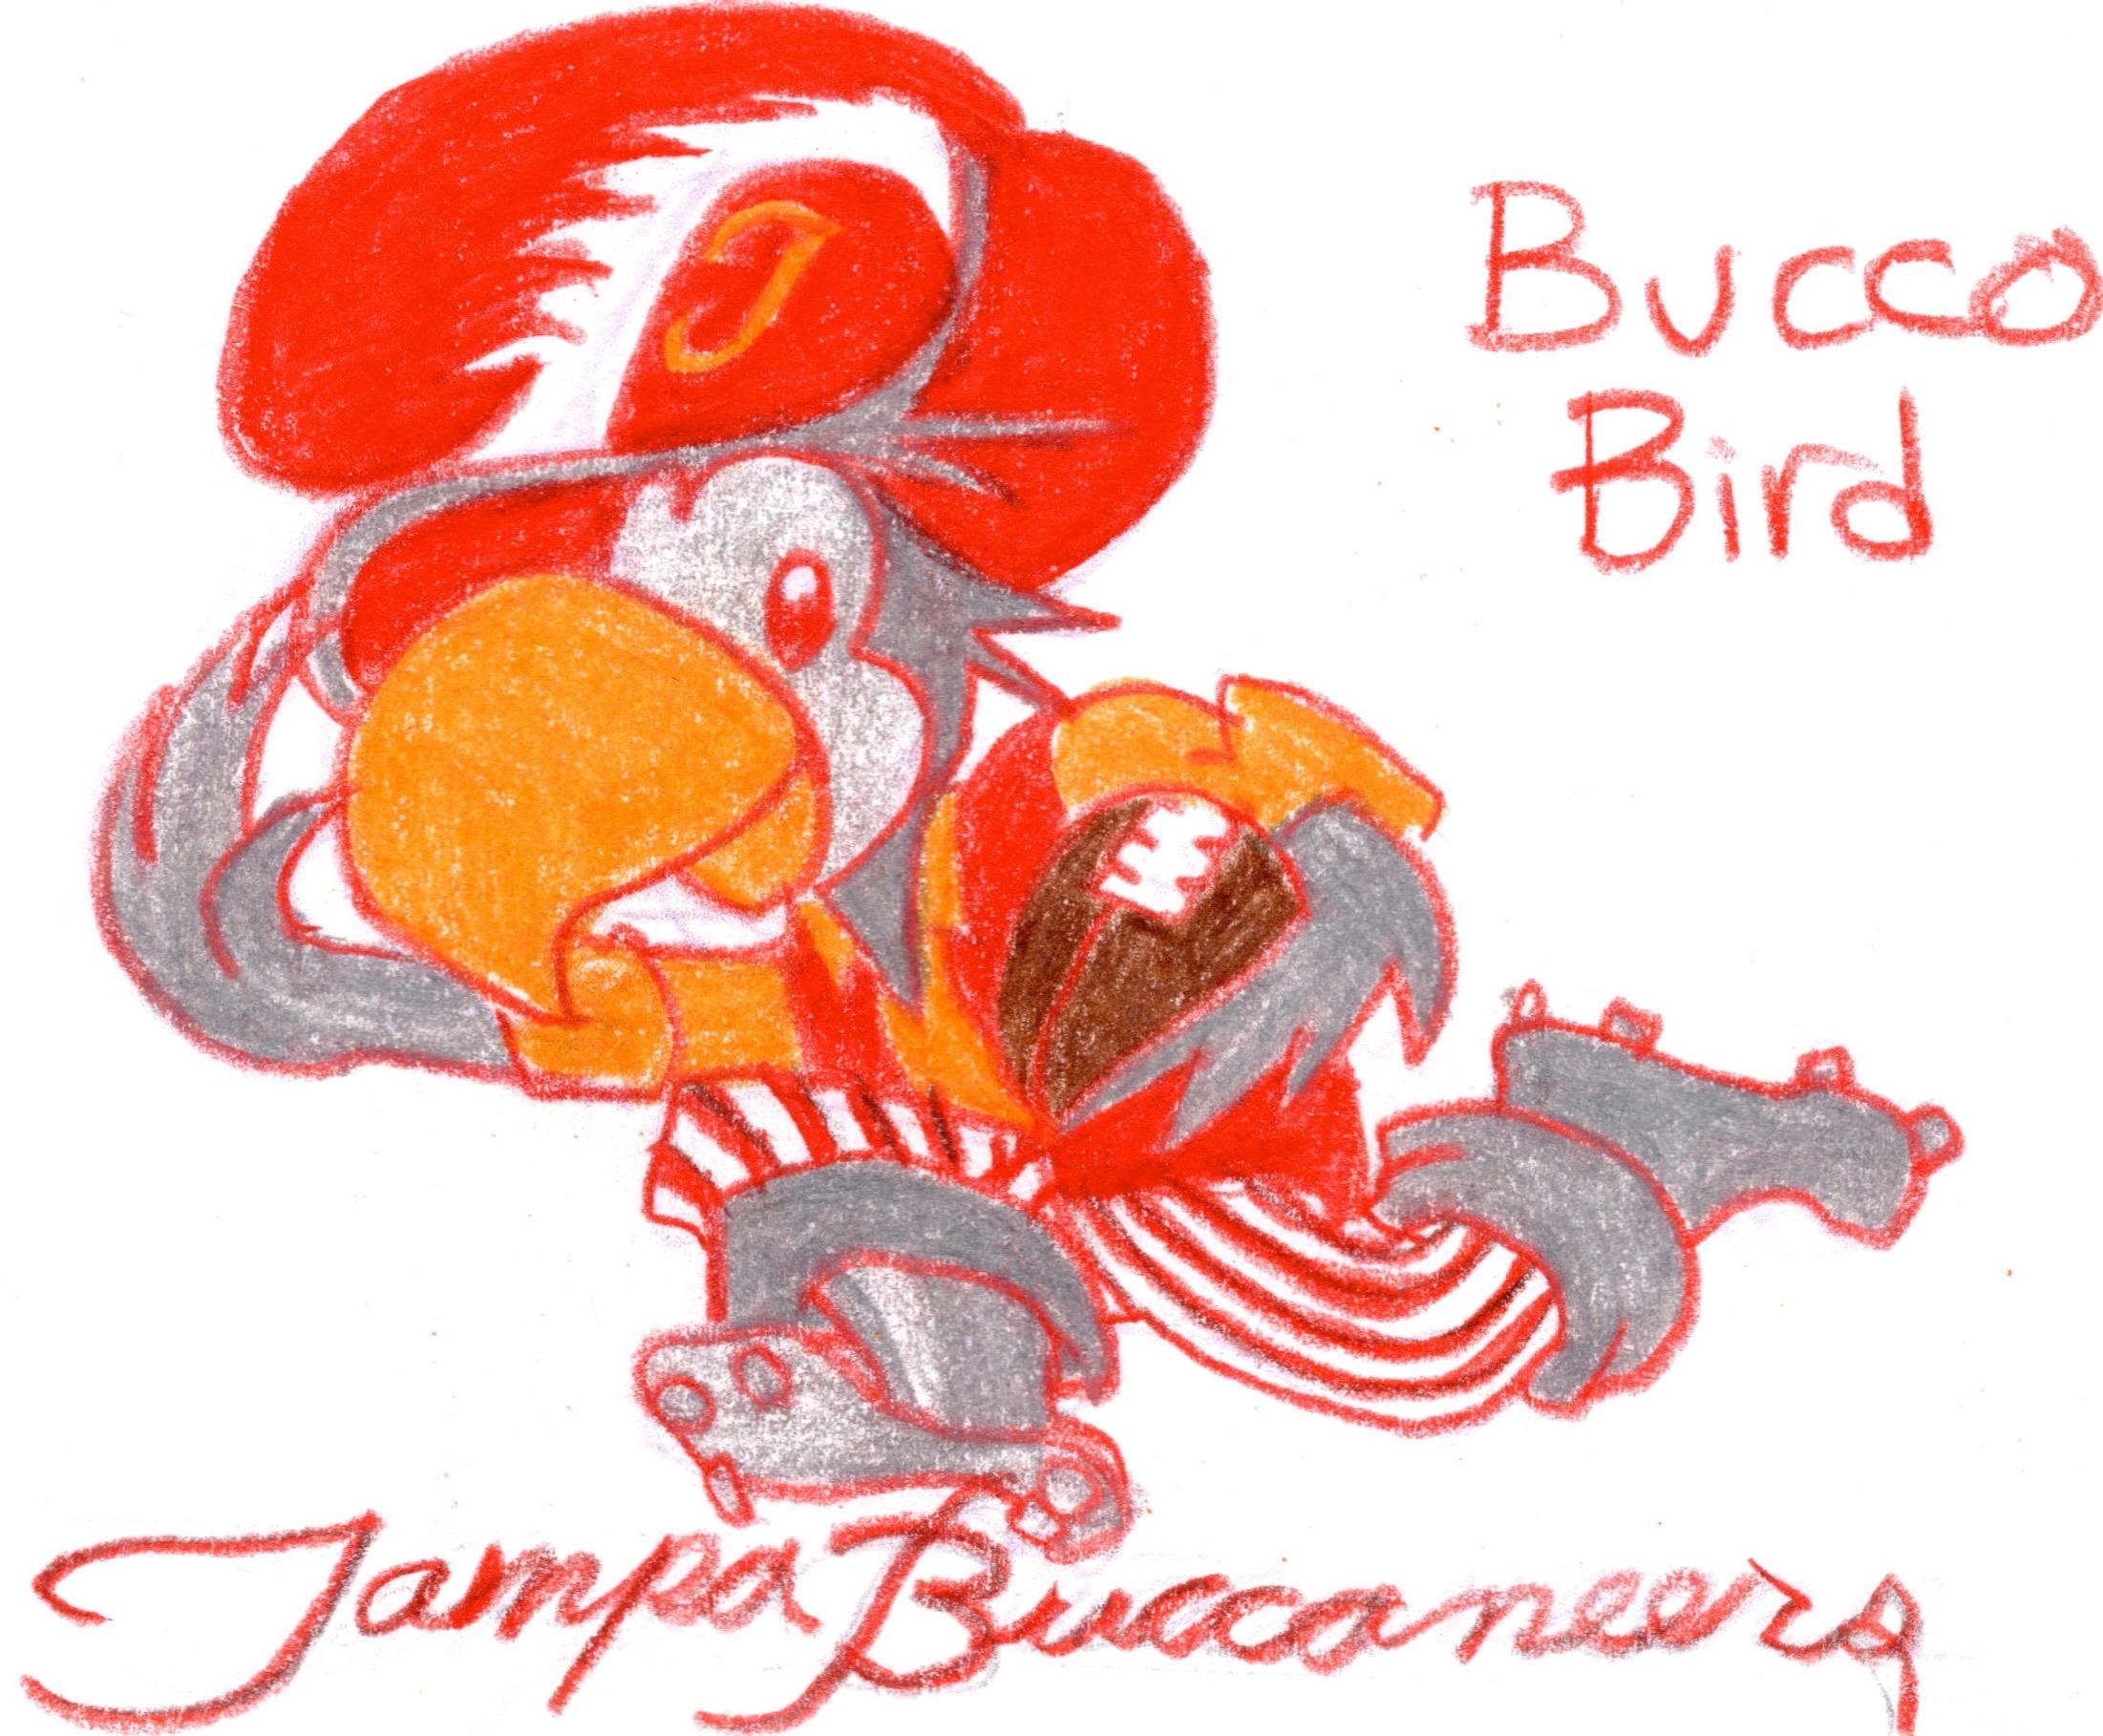 uniwatch tampa bay buccaneers redesign contest bierbaum